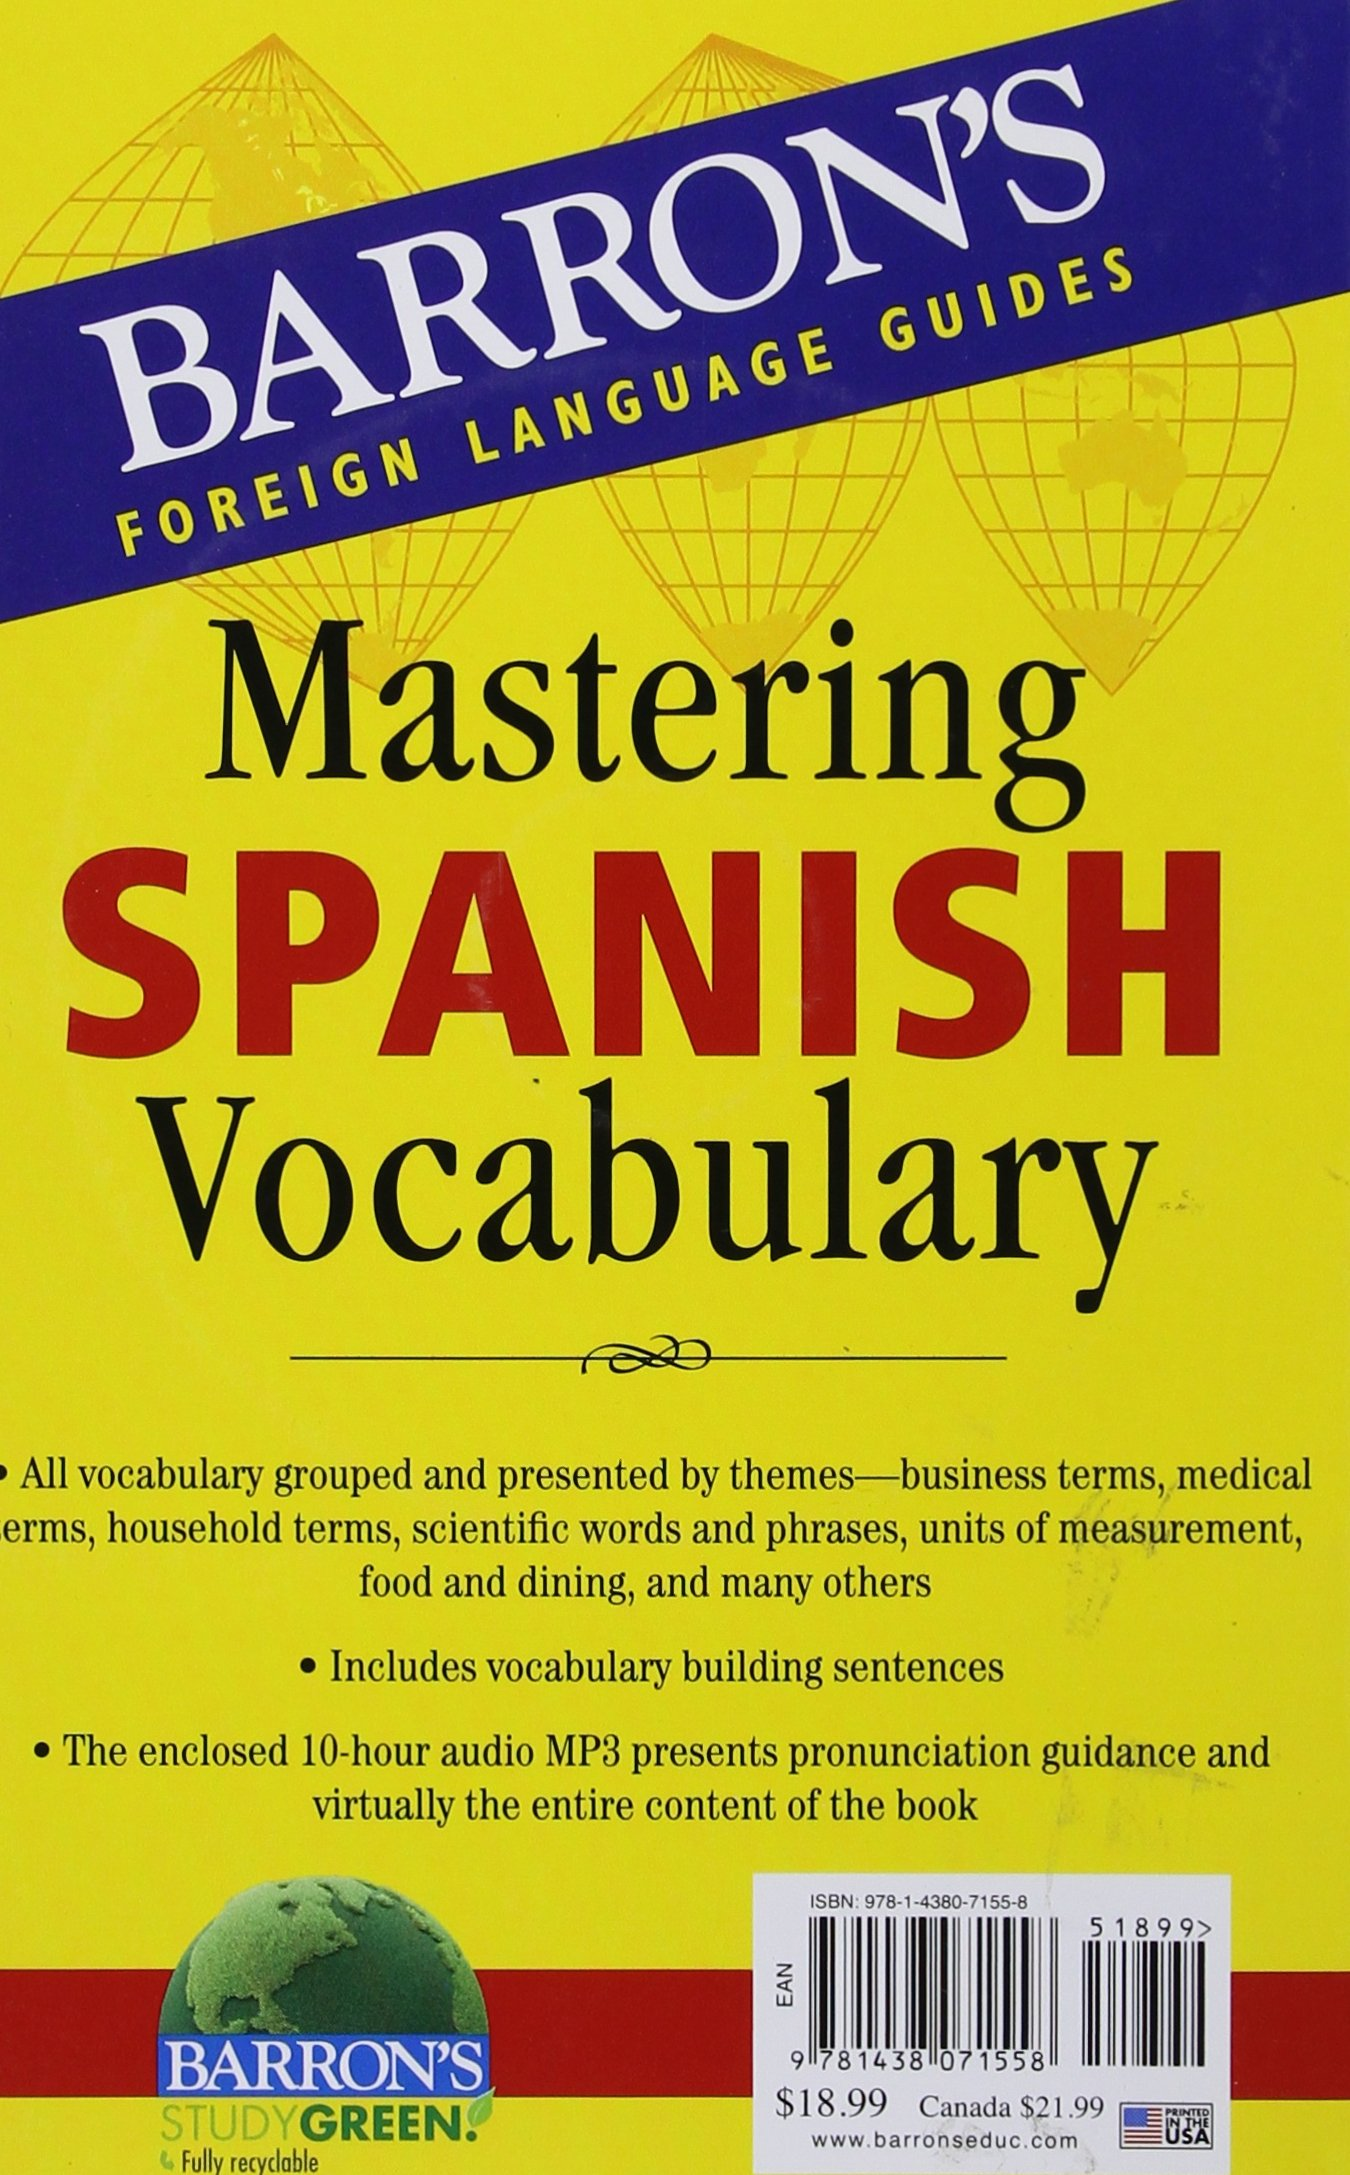 Amazon com: Mastering Spanish Vocabulary with Audio MP3 (Barron's